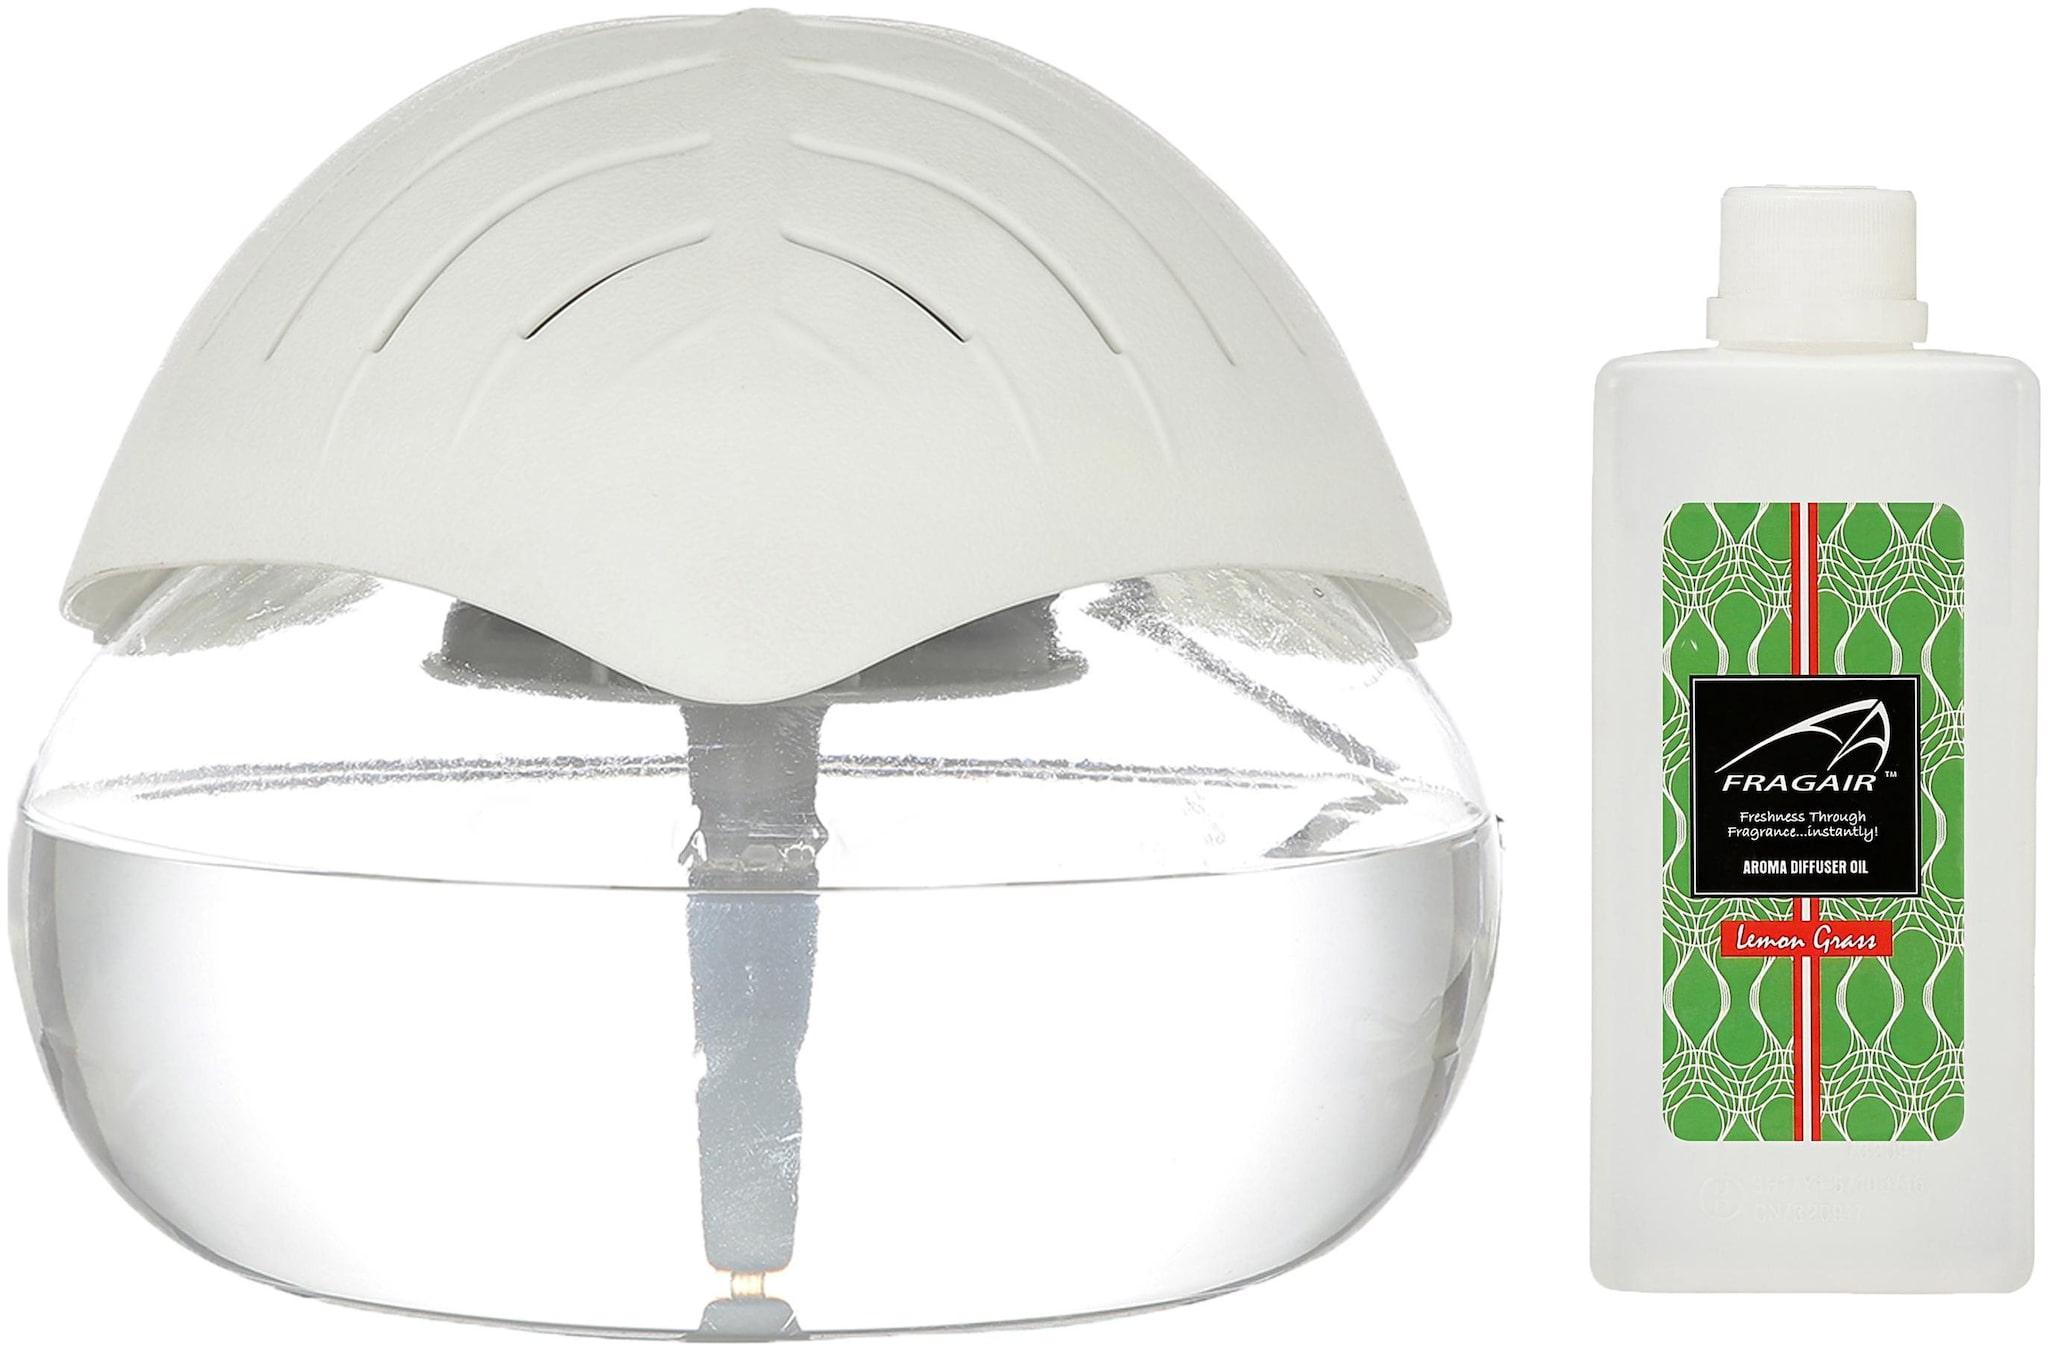 Fragair Portable Room Air Purifier Aroma Diffuser with Essential Aroma Oil  500ml;Lemon Grass